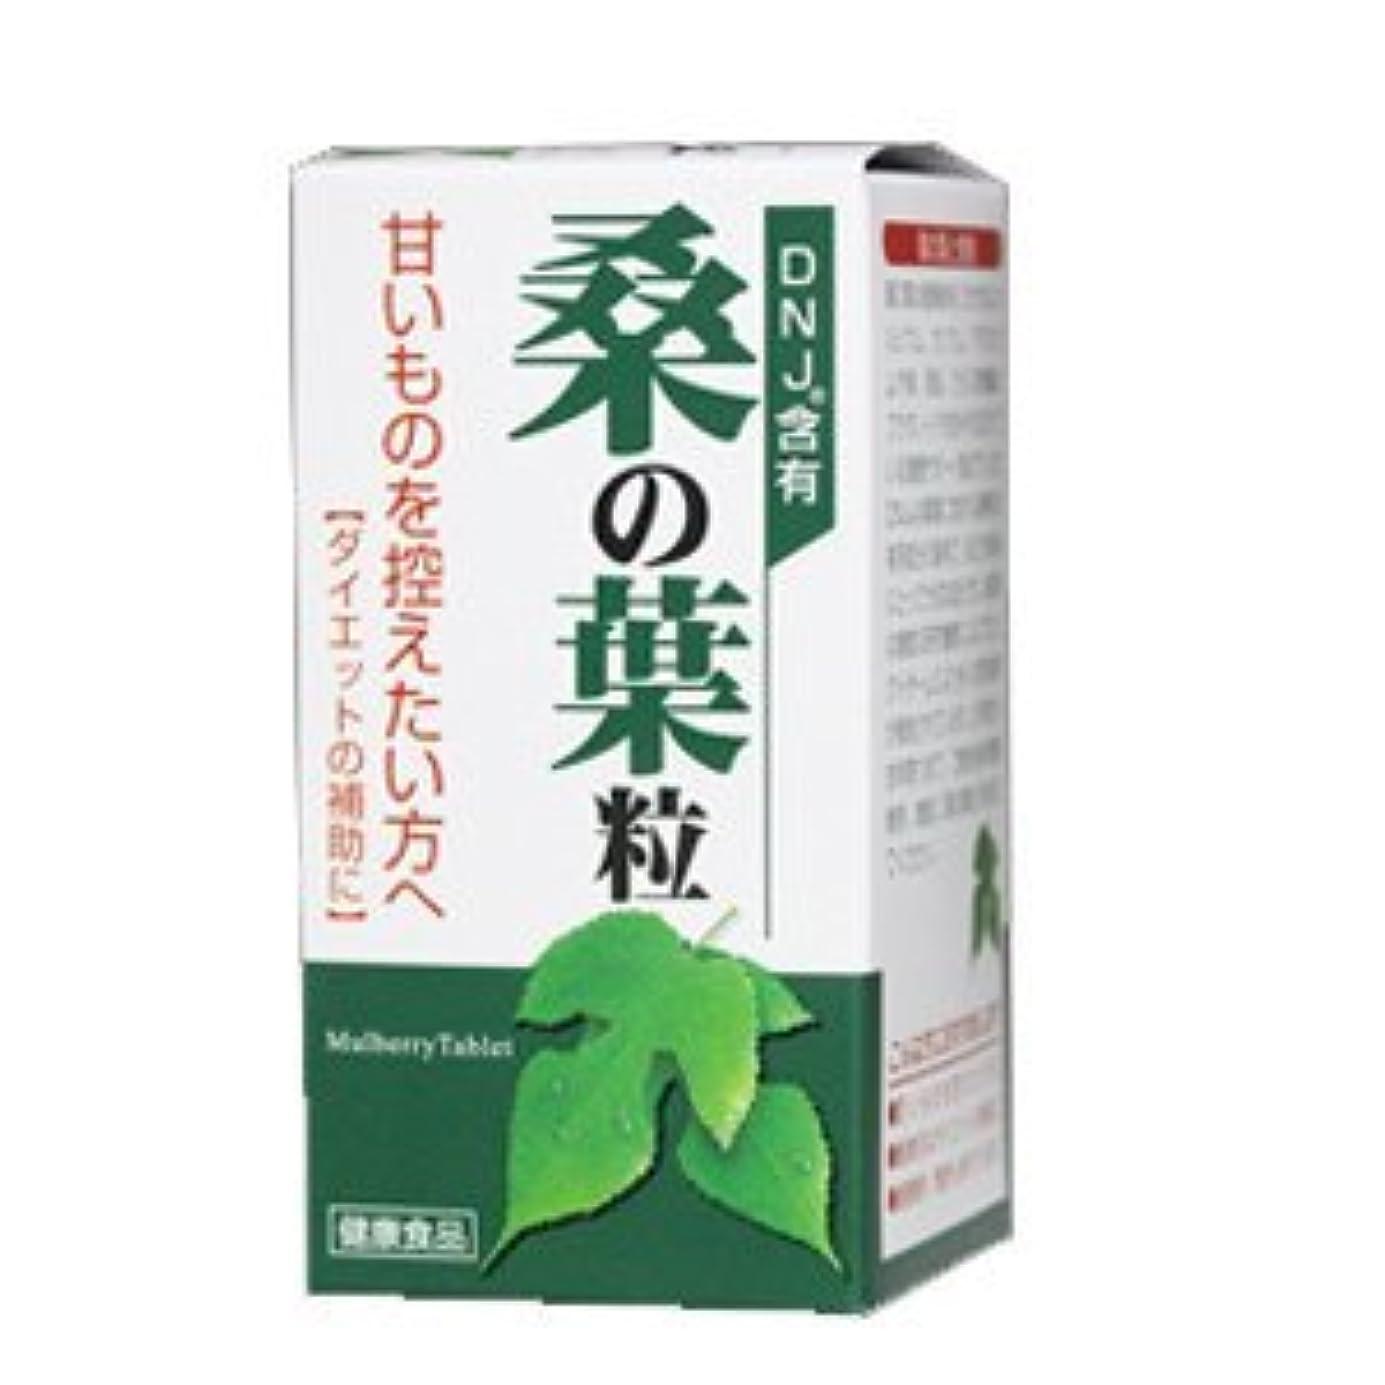 マージ端末弁護人桑の葉粒 270粒 2個 大草薬品